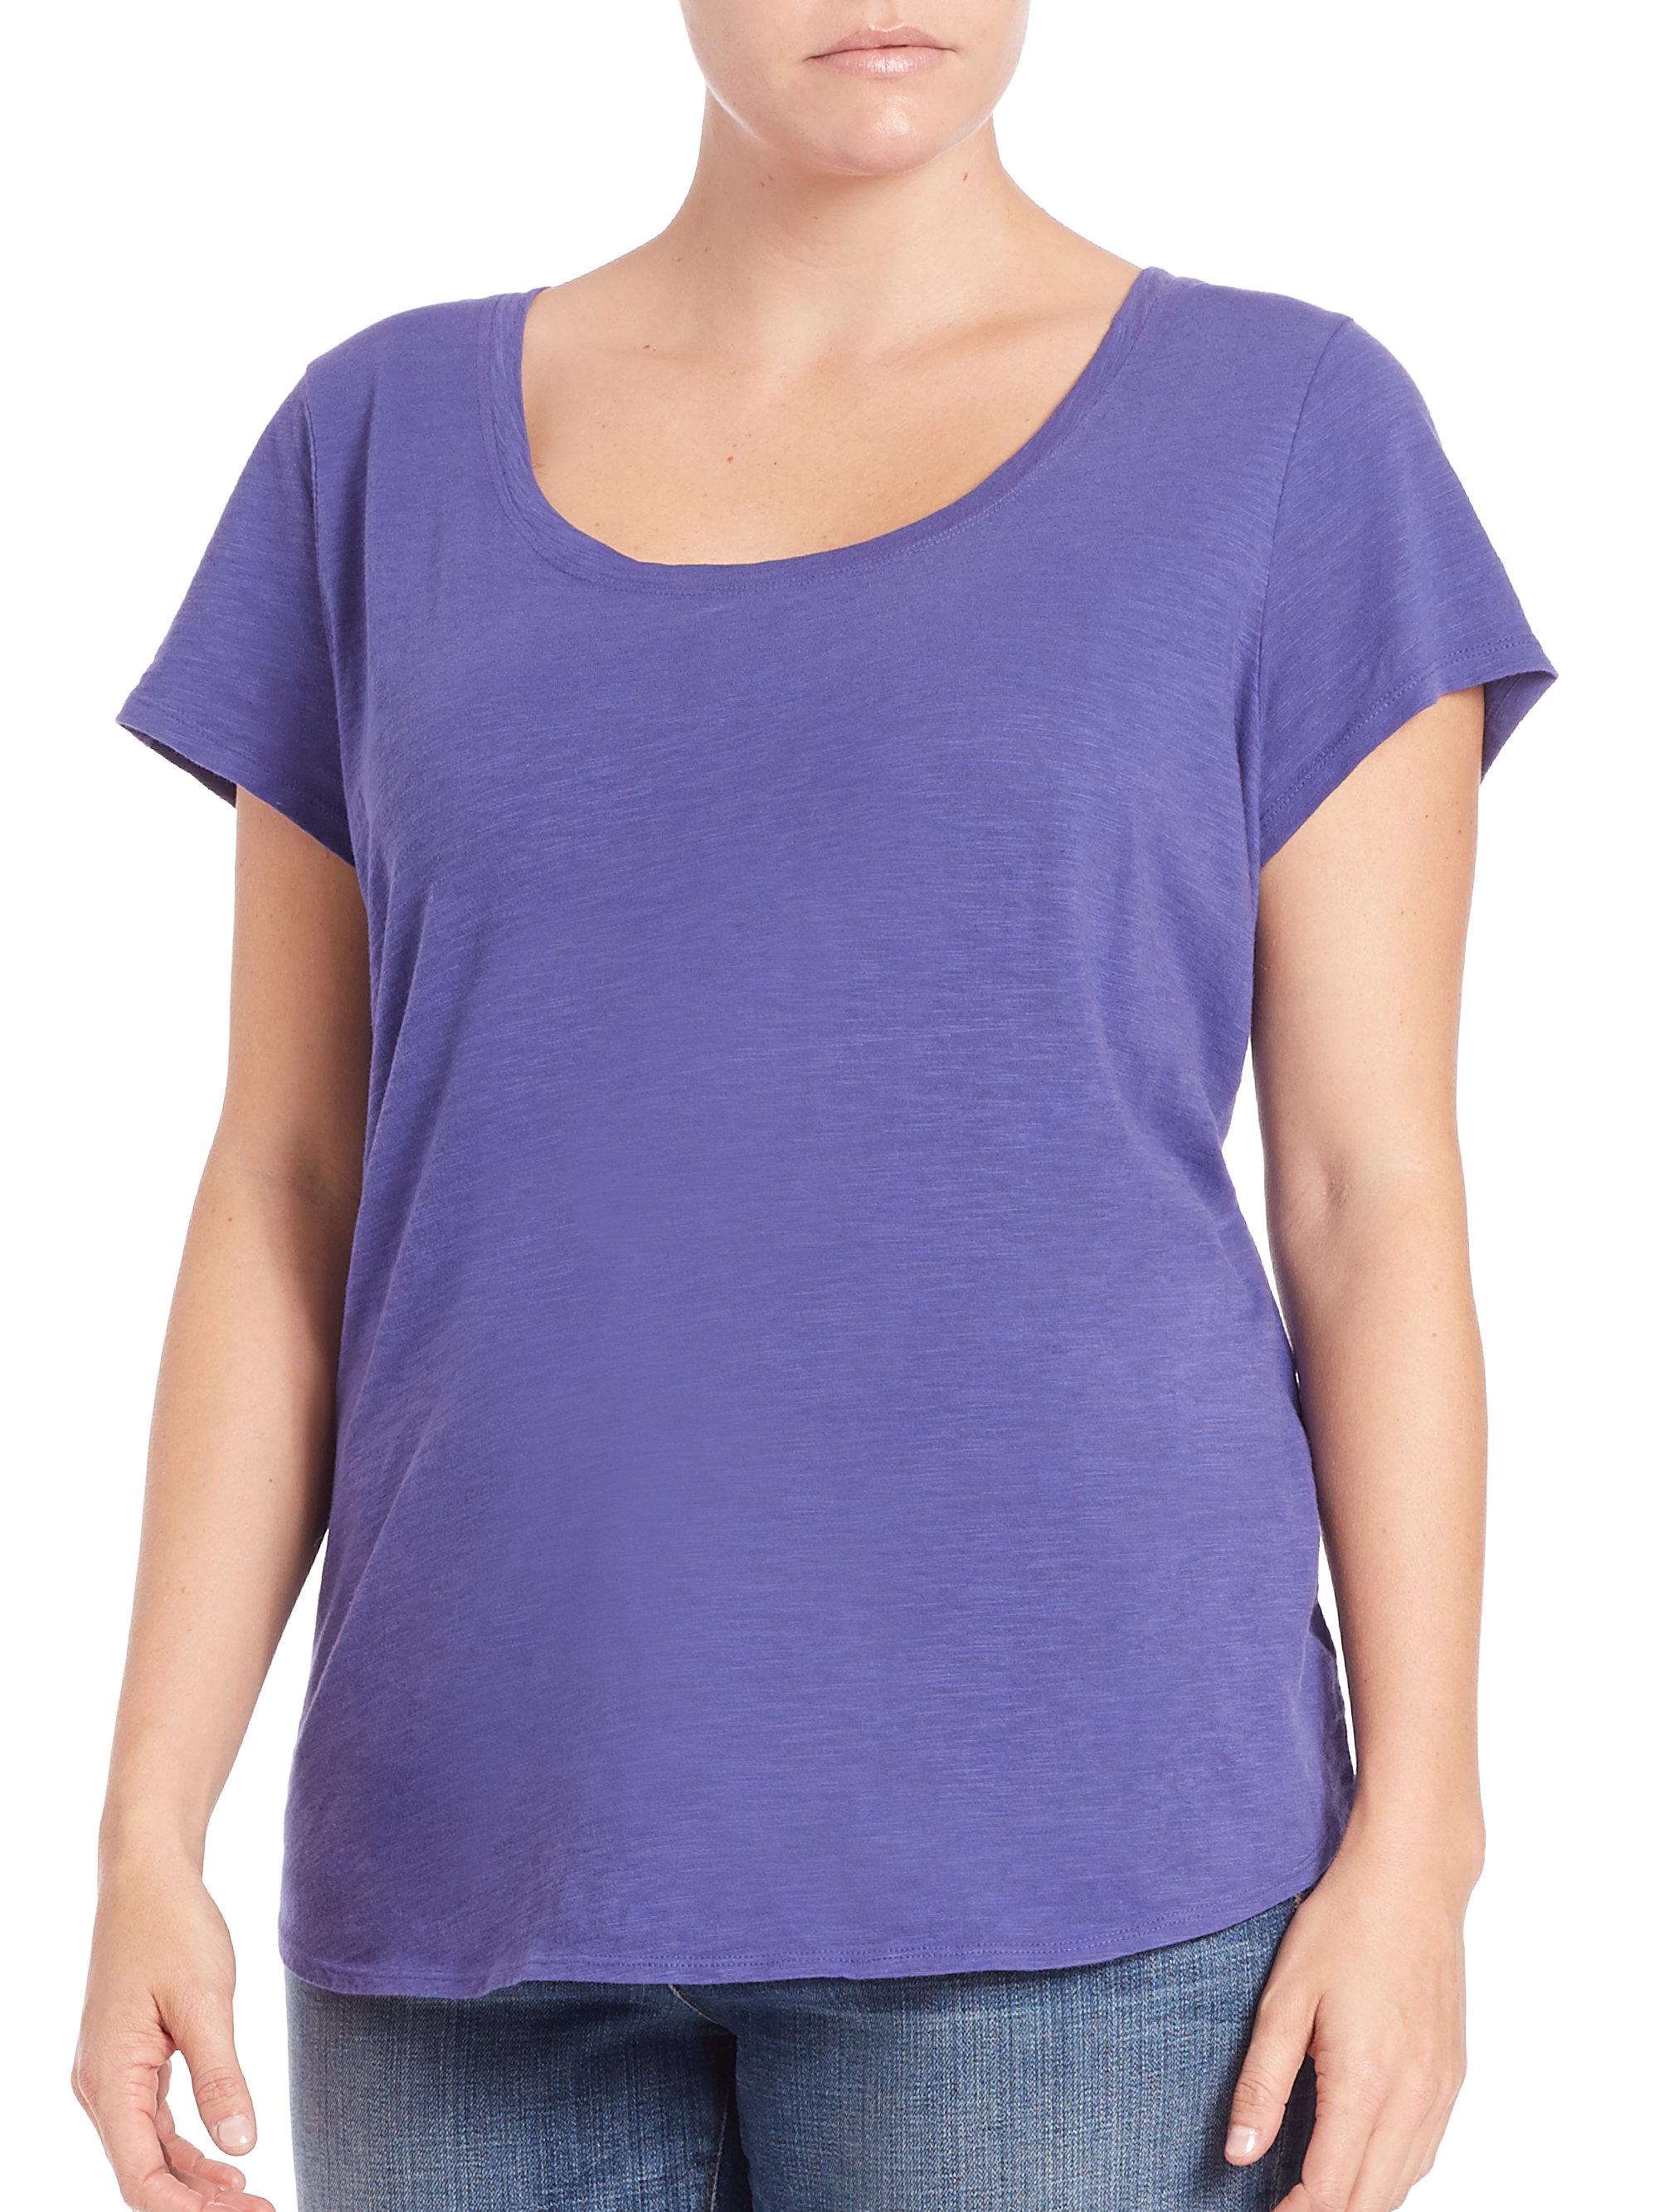 Eileen fisher cotton jersey scoopneck tee in blue iris for Eileen fisher organic cotton t shirt